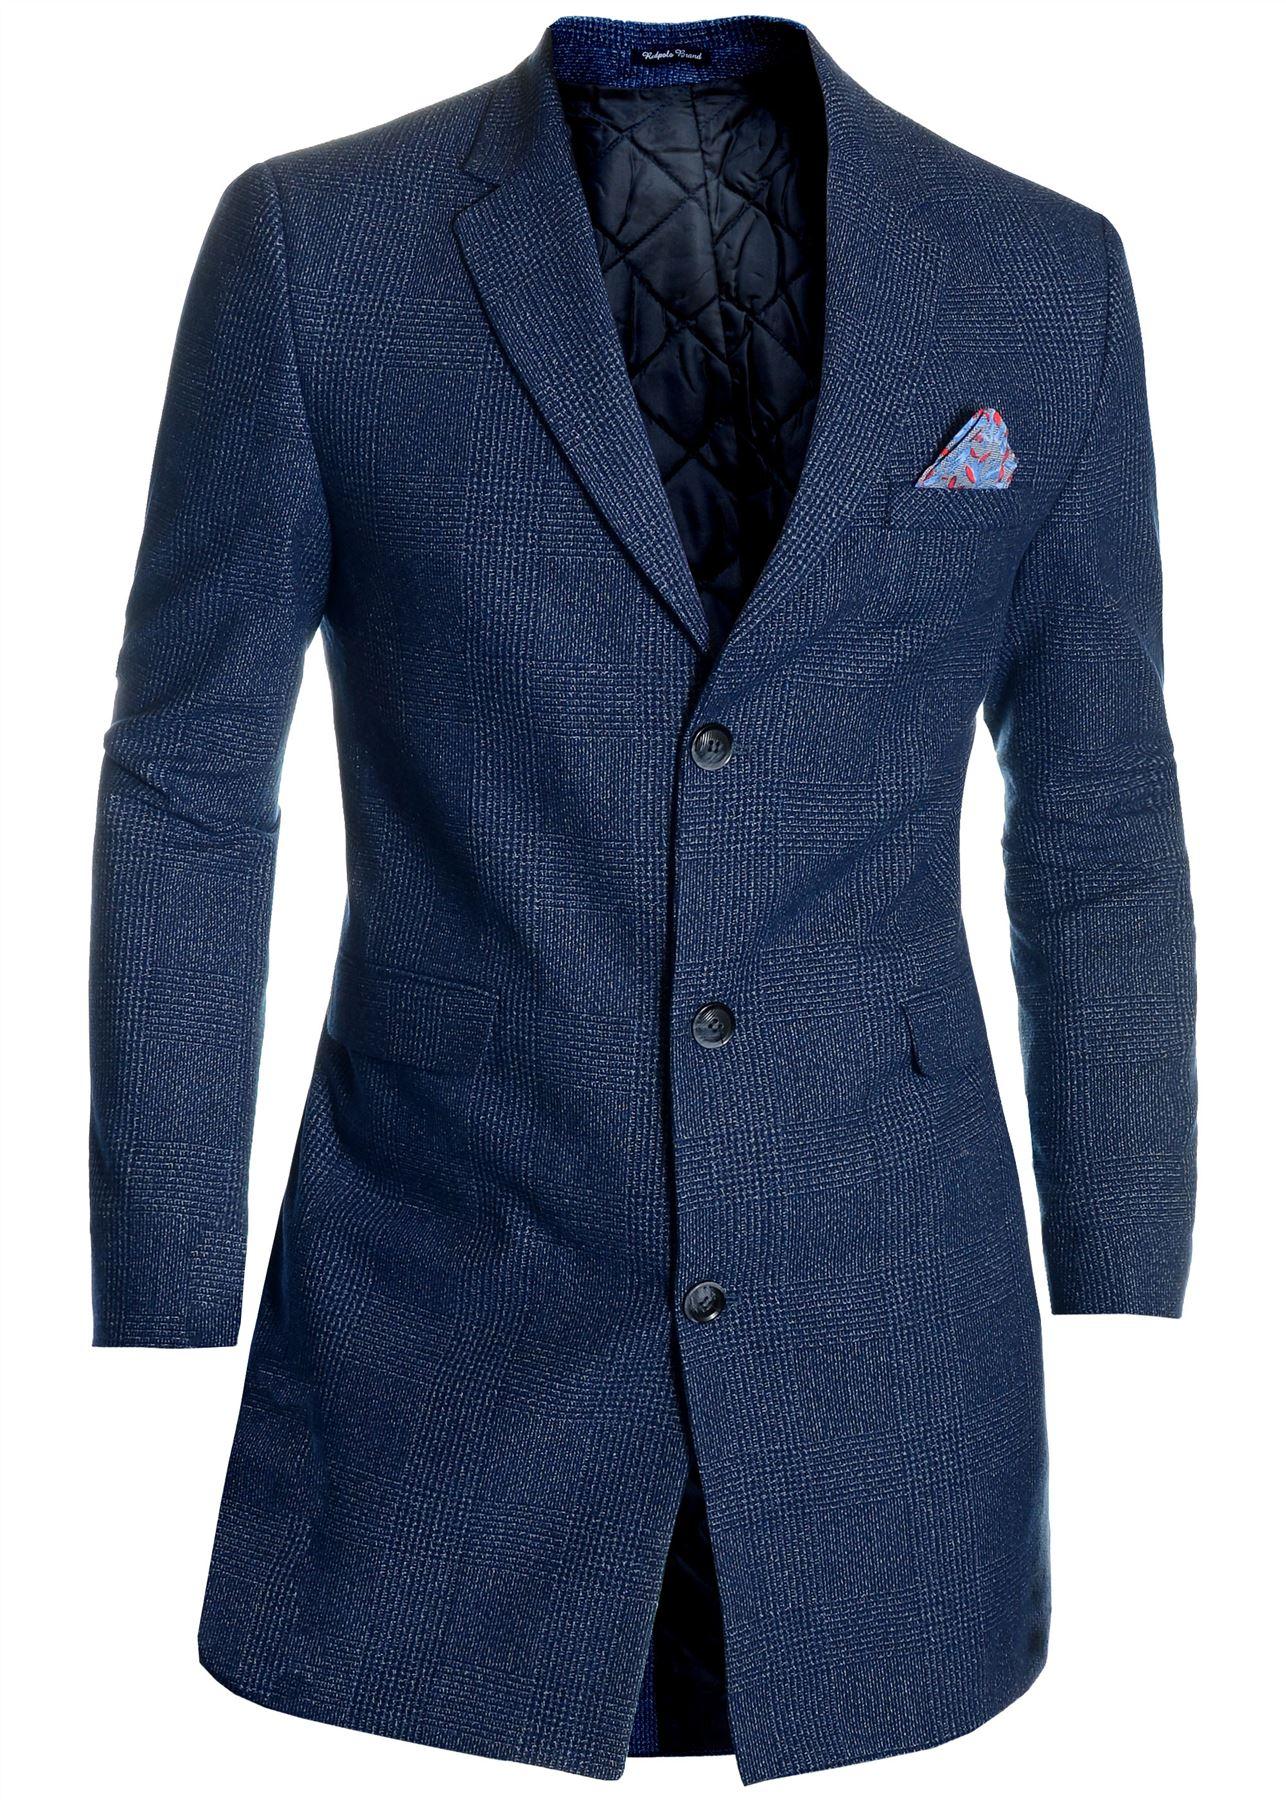 Men-039-s-Checkered-Coat-3-4-Long-Tweed-Cashmere-Wool-Trendy-Formal-Winter-Overcoat thumbnail 3